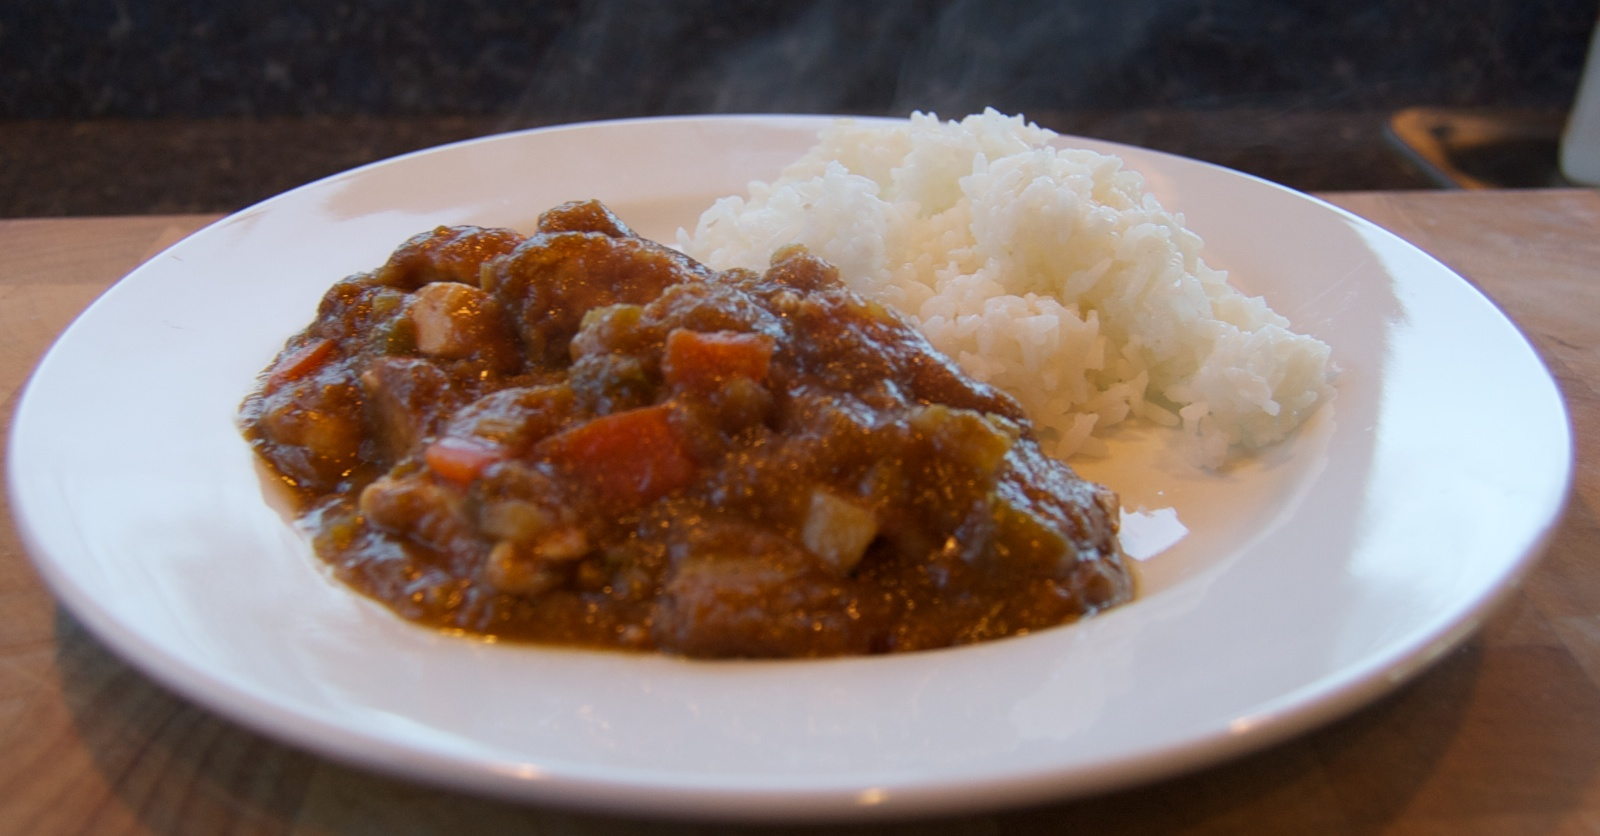 http://blog.rickk.com/food/2012/03/11/ate.2012.03.11.d.jpg